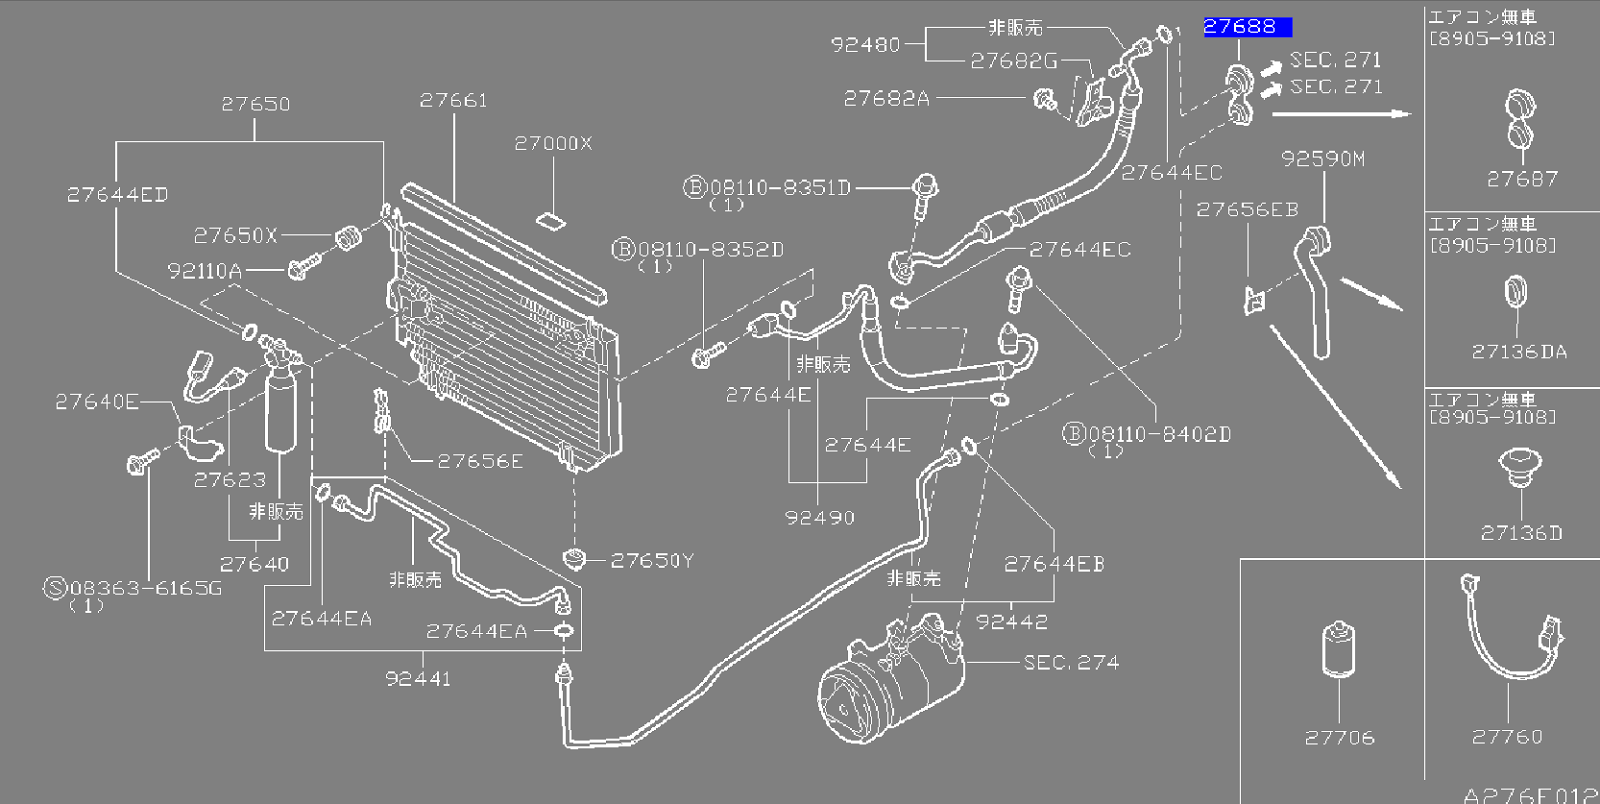 hight resolution of ac wiring diagram r32 gtr use wiring diagram ac wiring diagram r32 gtr